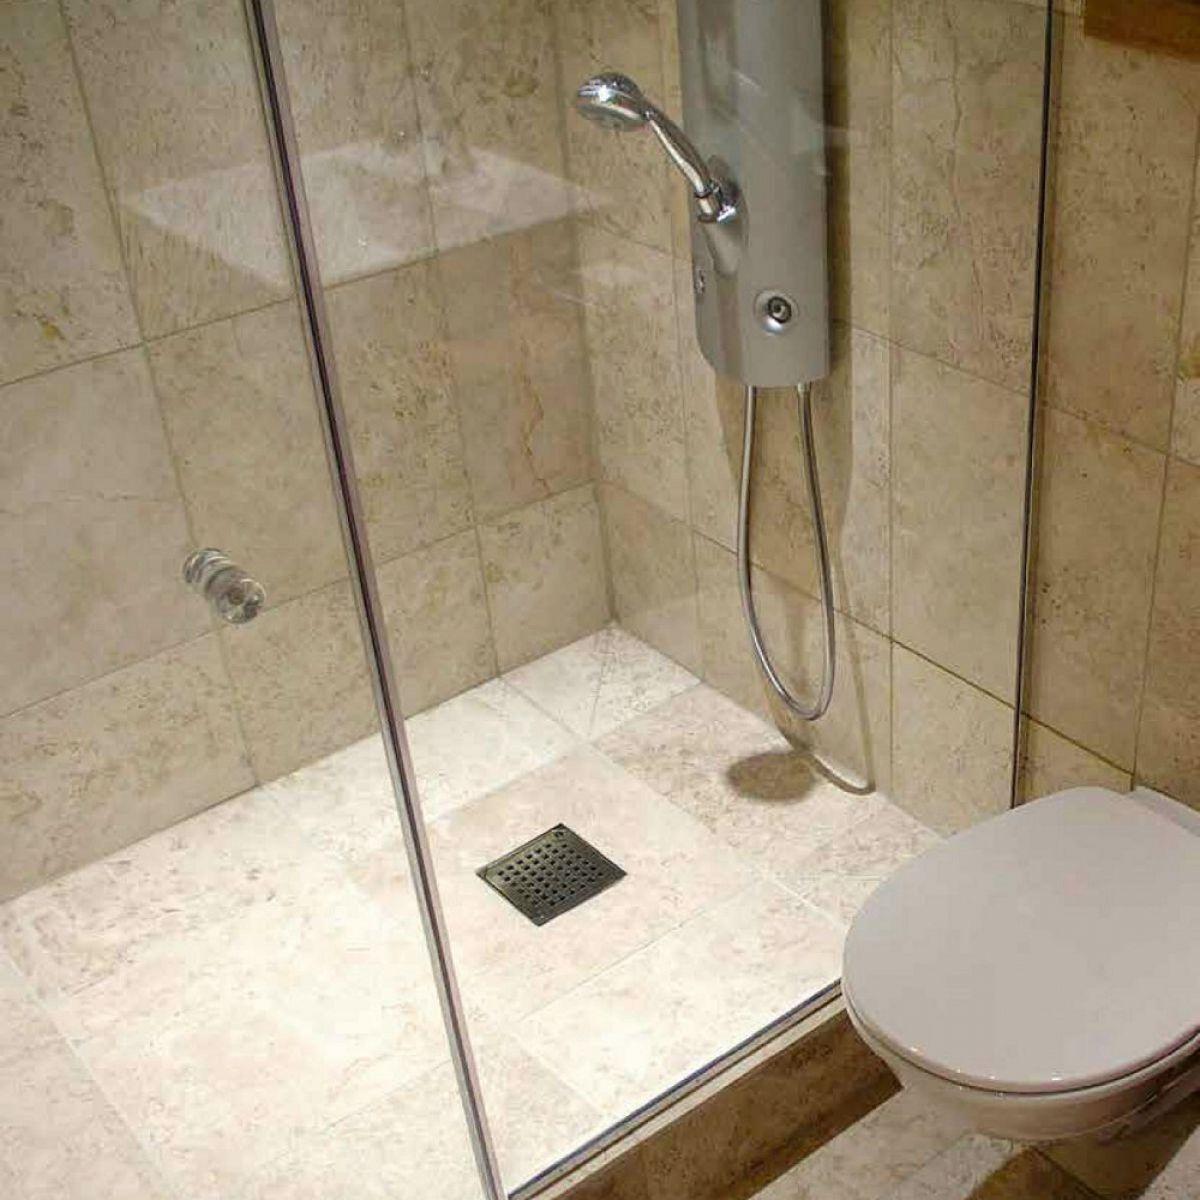 Amusing Square Drain Uk Wet Room Bathroom Layout Wet Room Bathroom Cost Abacus Elements Concept Raised Wetroom Square Drain Abacus Elements Concept Raised Wetroom houzz-03 Wet Room Bathroom